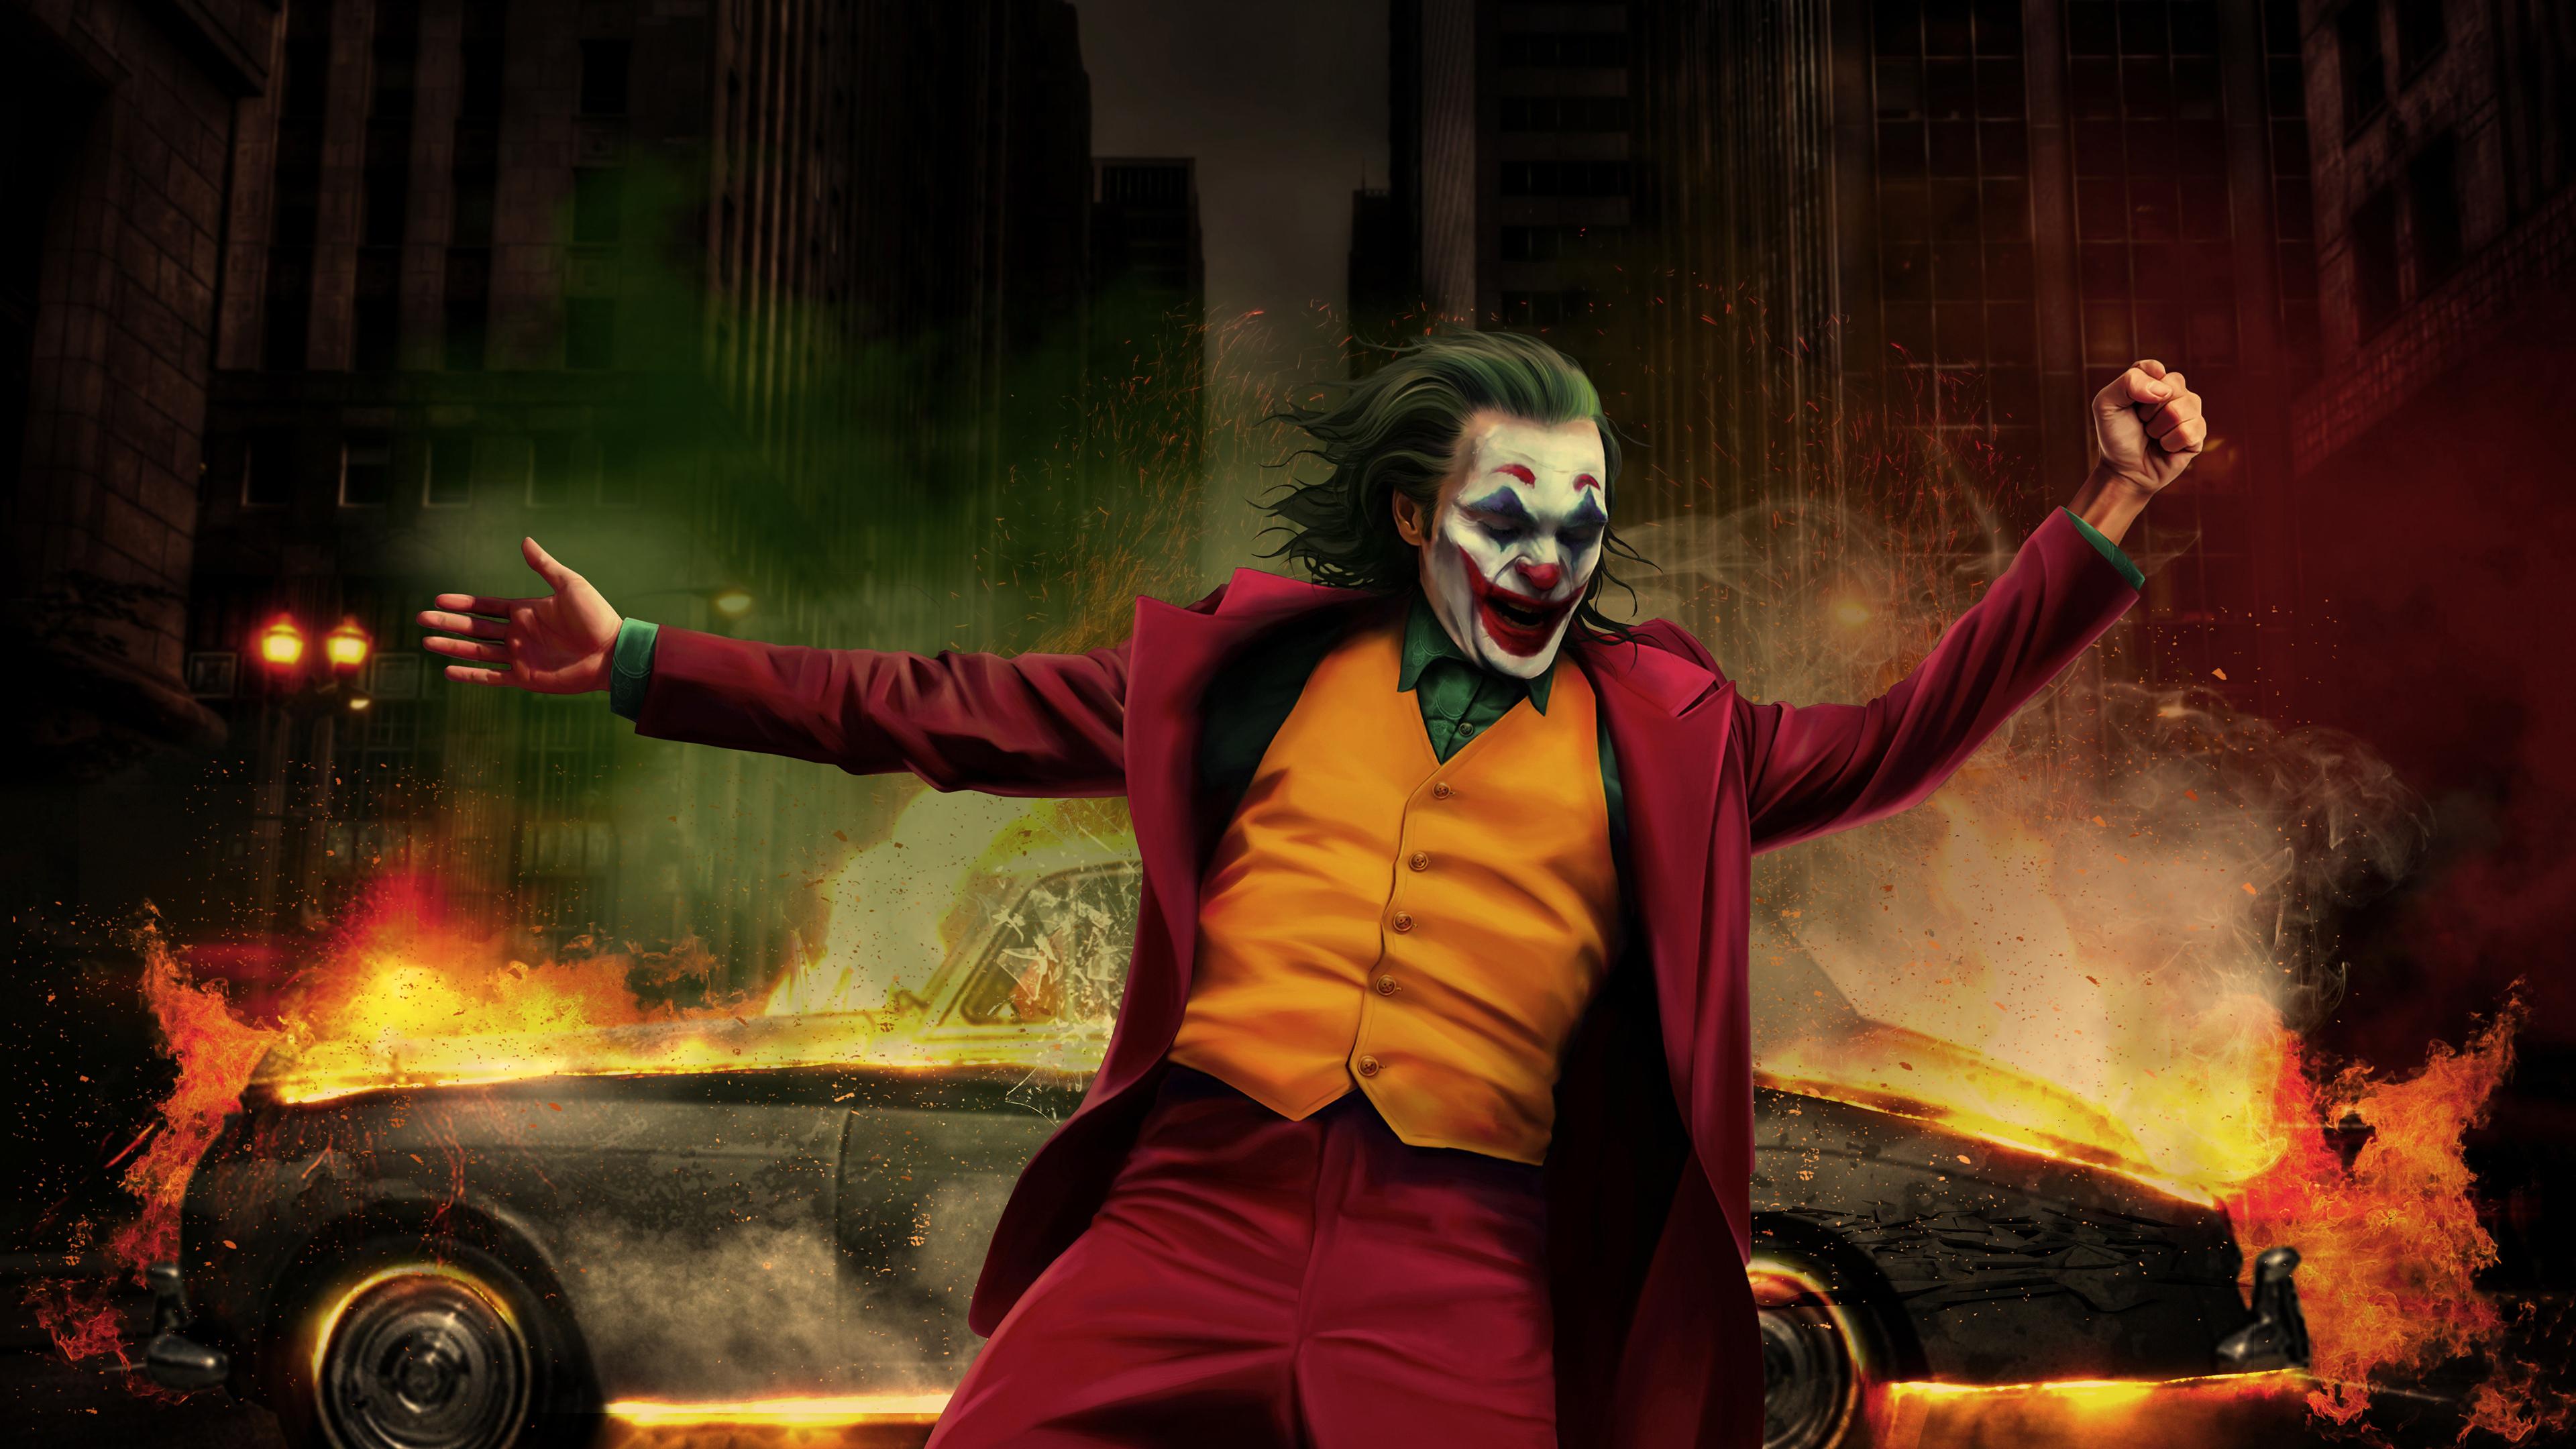 Wallpaper 4k Joker Happy Dancing 4k Wallpapers Hd